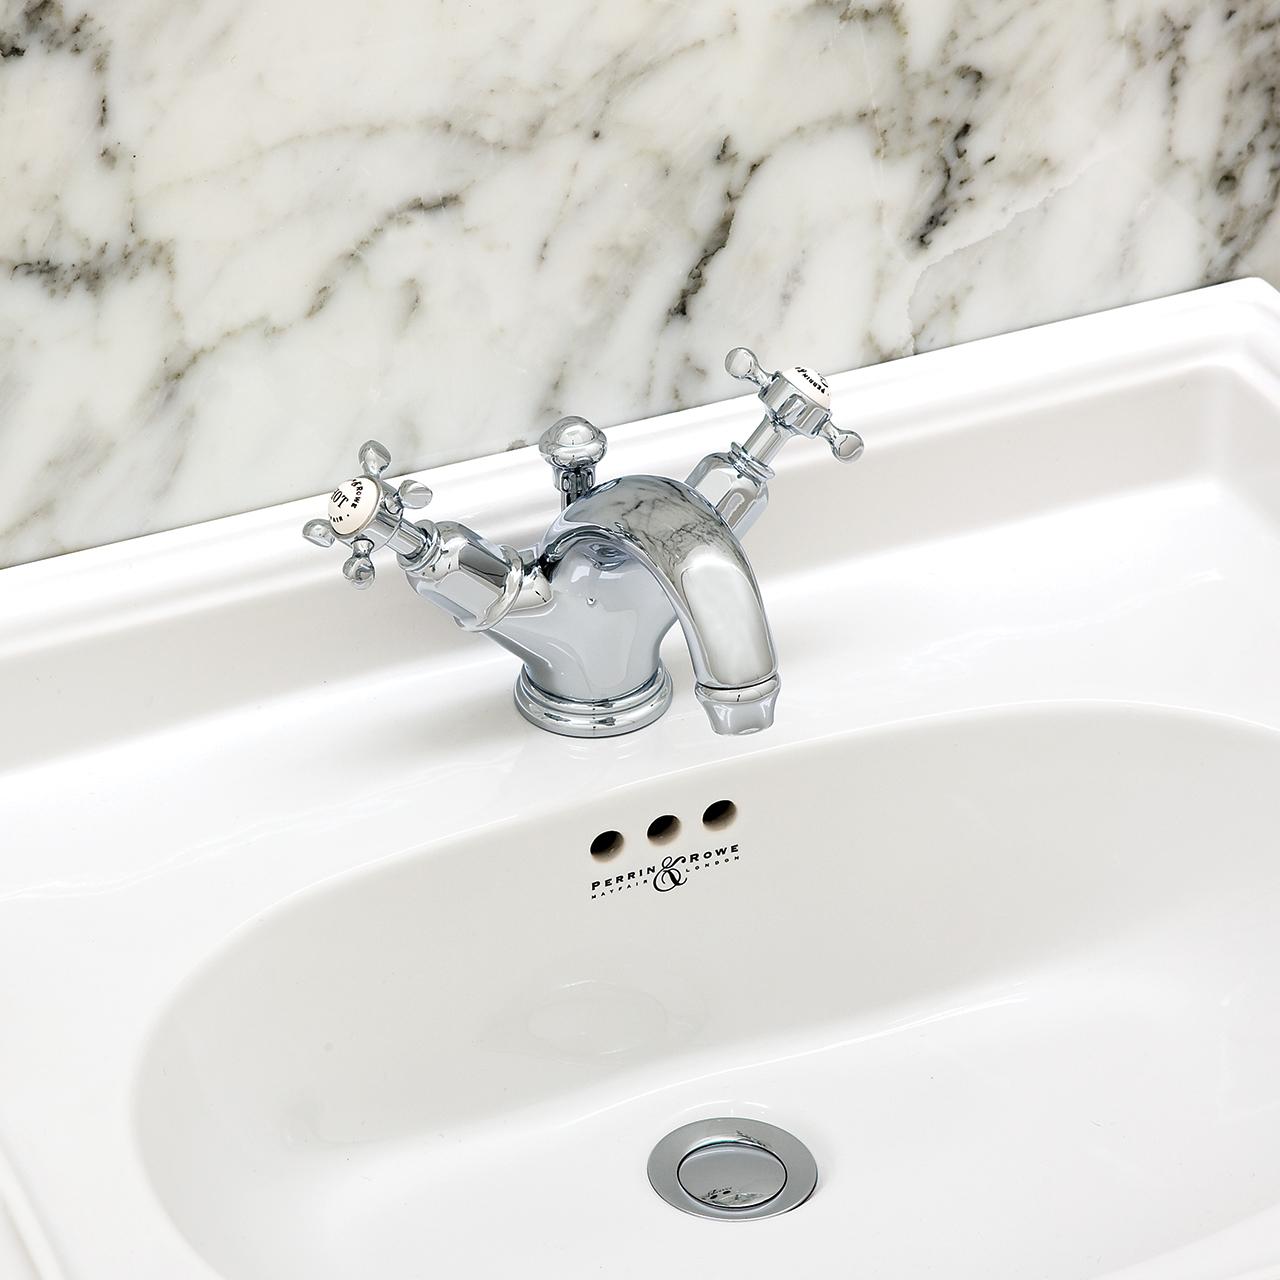 Perrin-and-Rowe Monobloc basin mixer with crosshead handles -3626.jpg